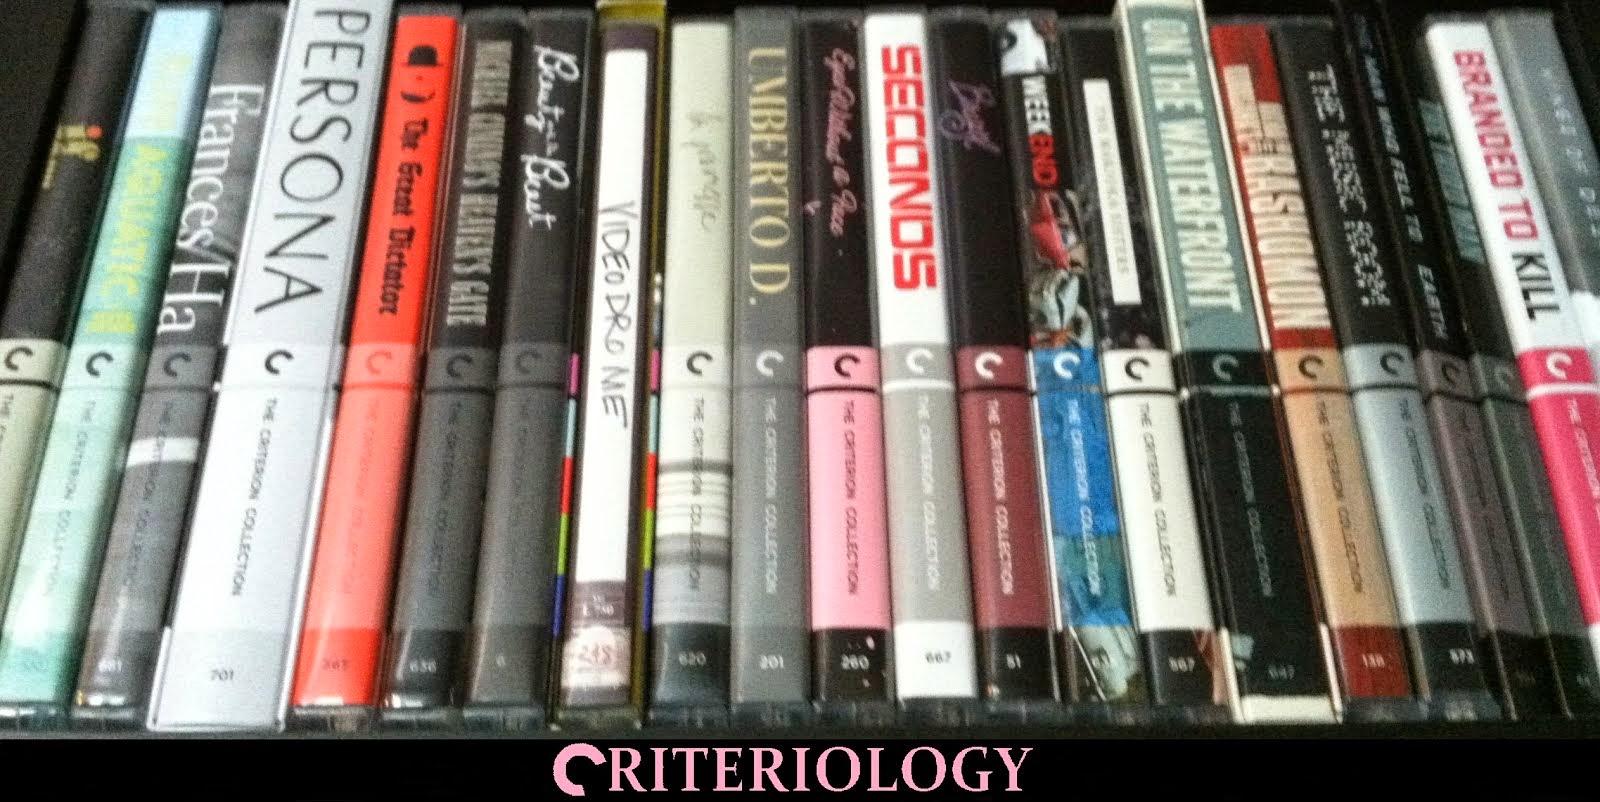 CRITERIOLOGY